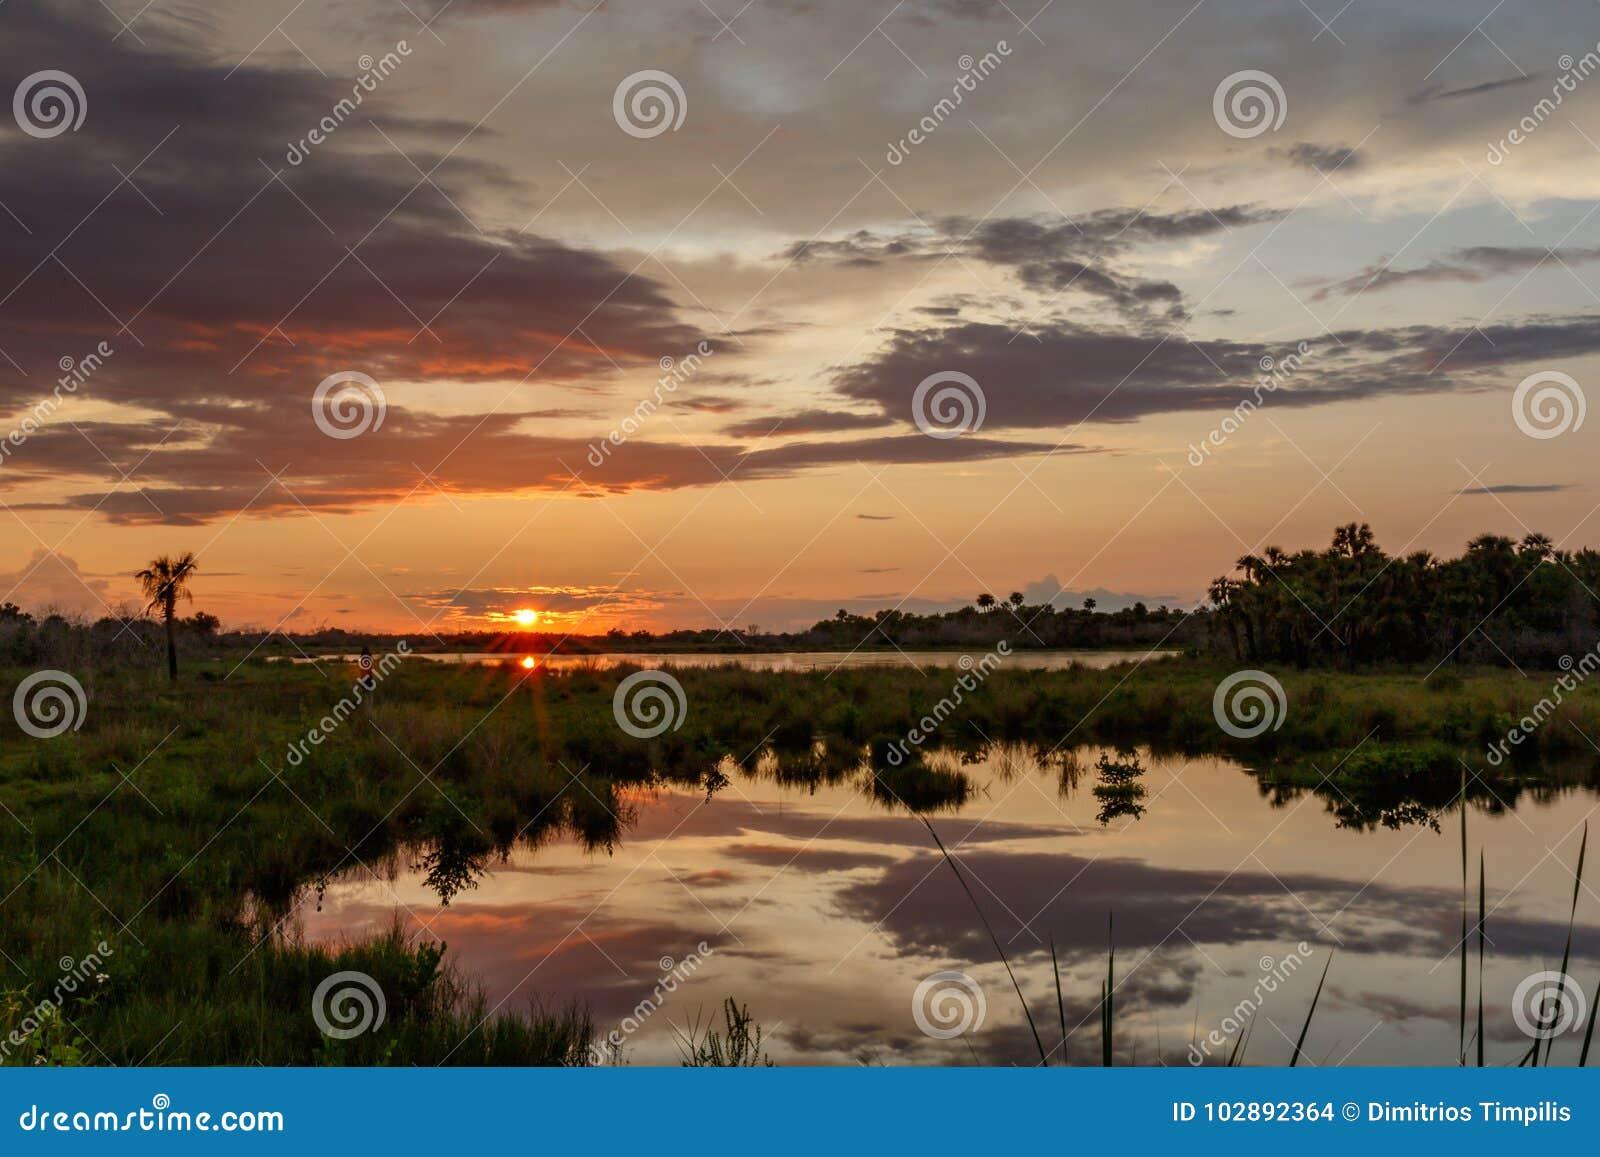 Sunset at Merritt Island National Wildlife Refuge, Florida